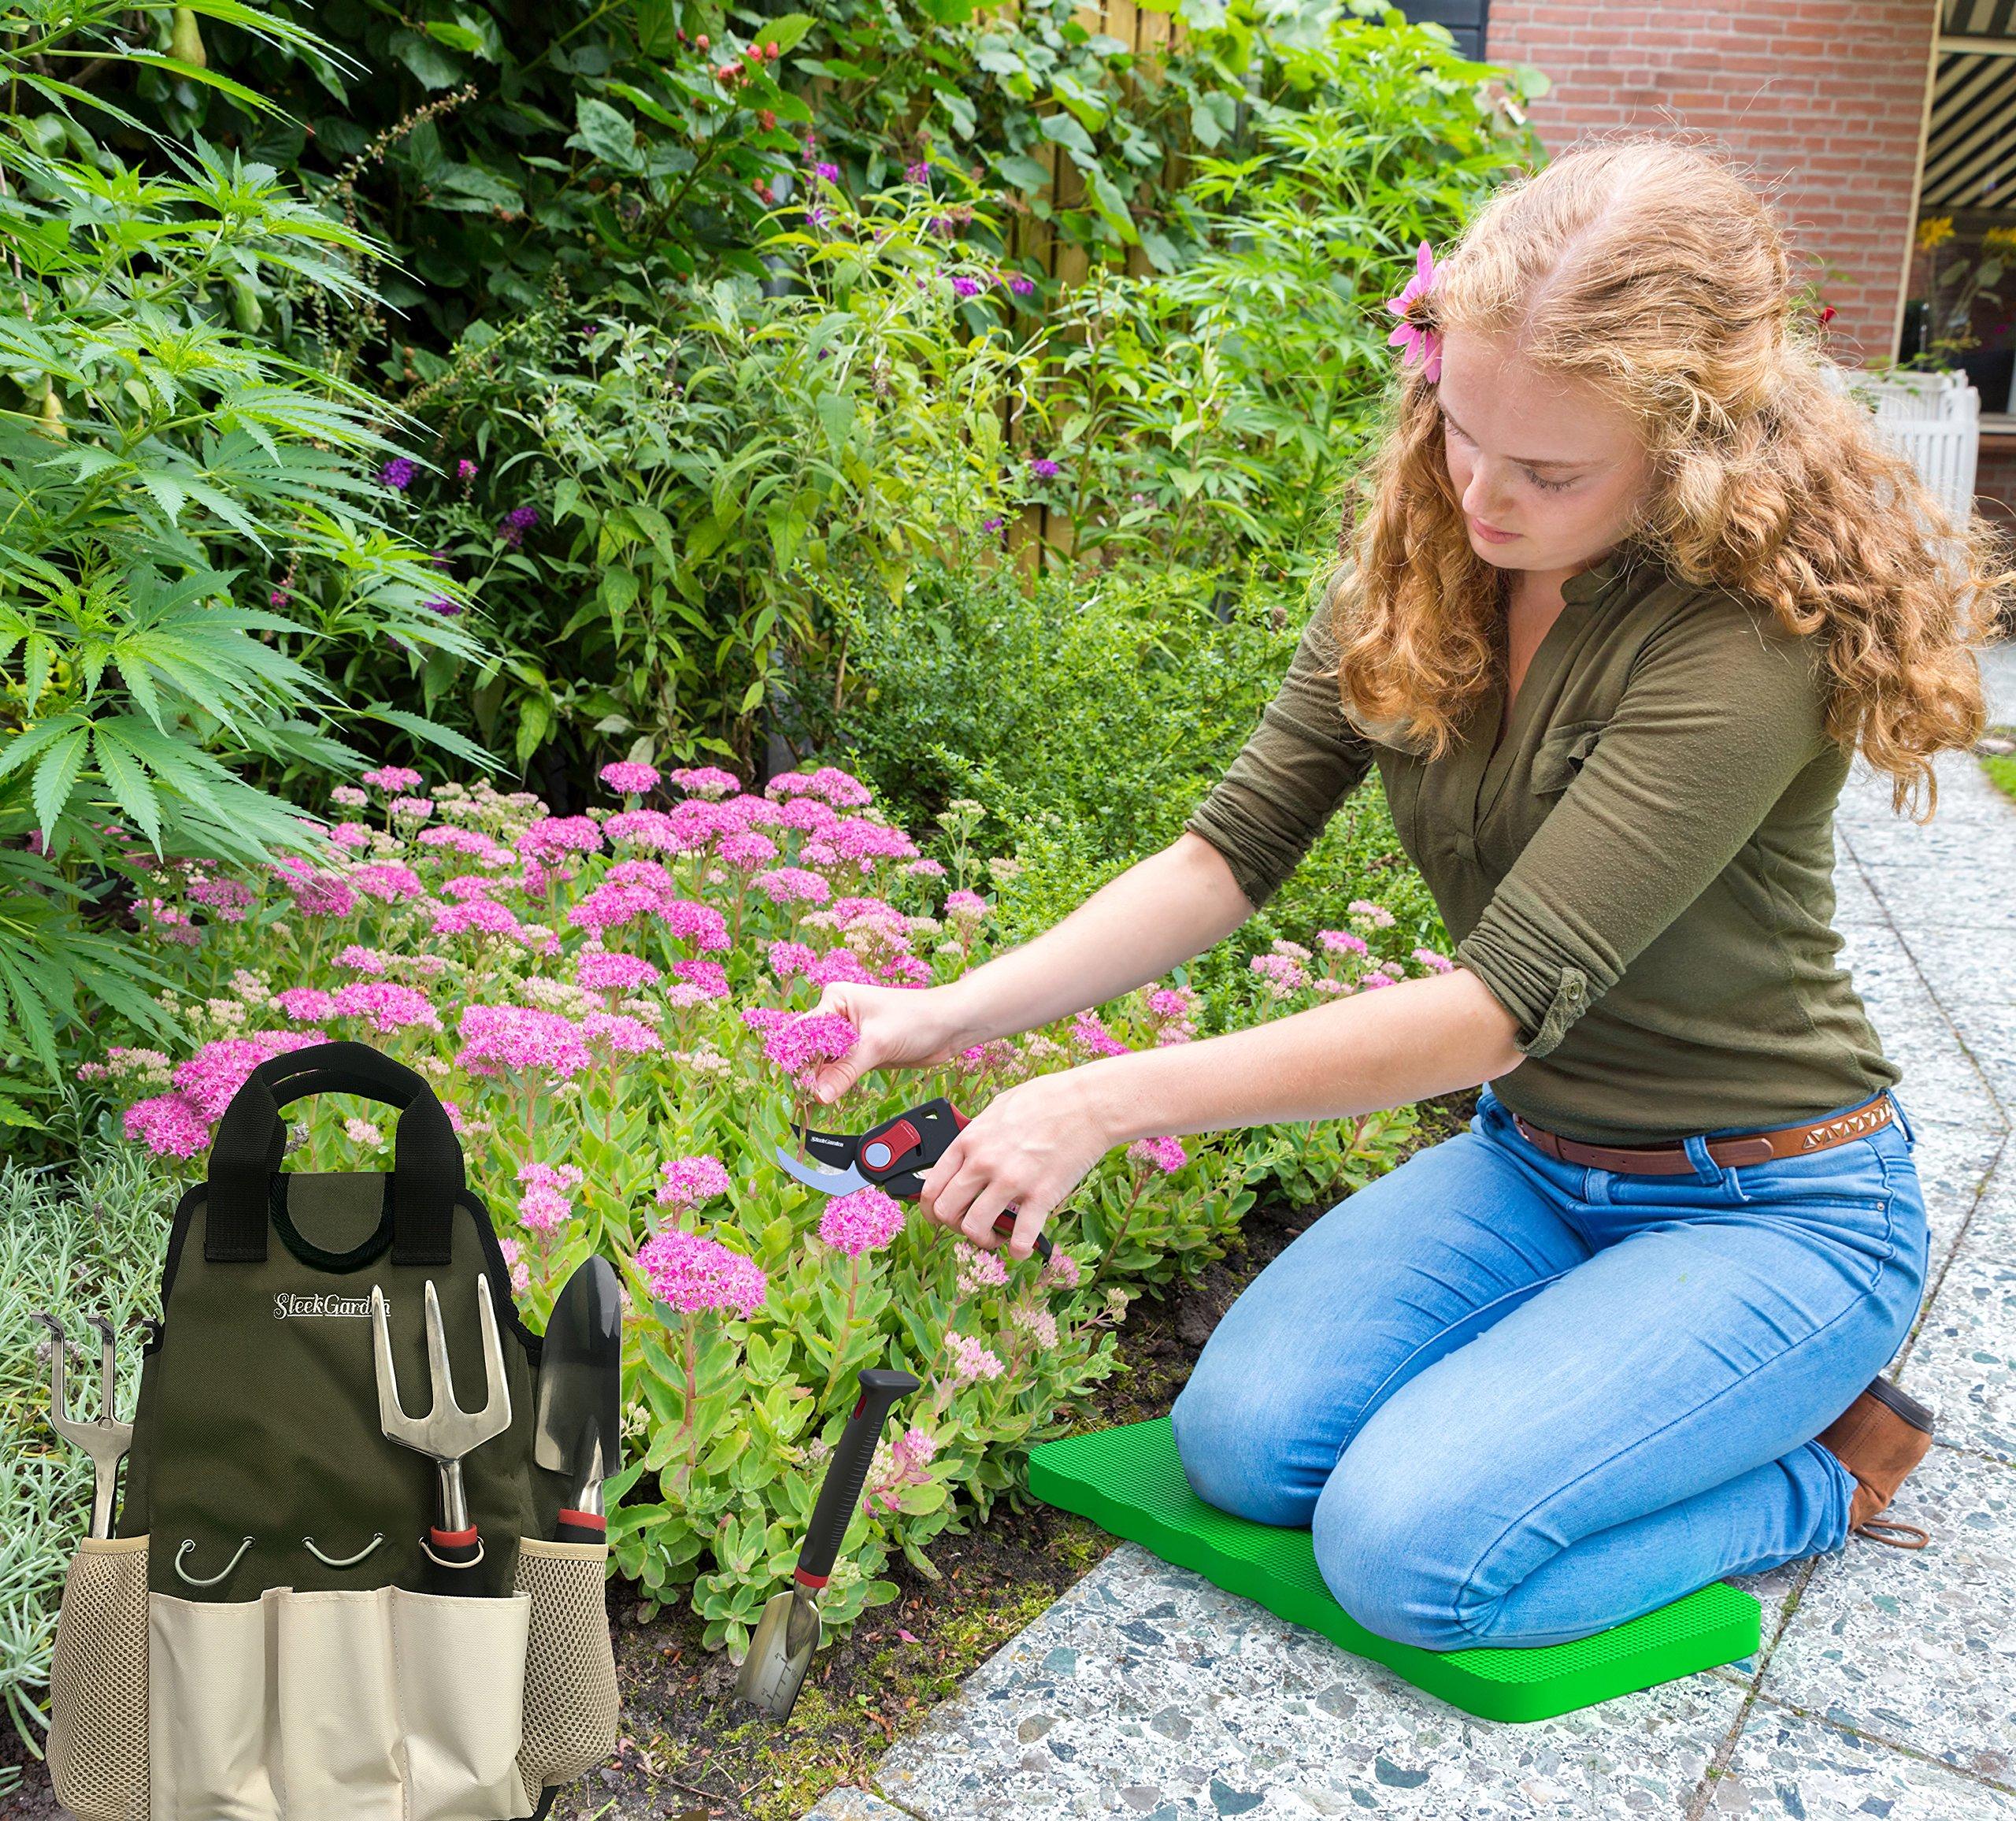 Comfort Plus 7-Piece Gardening Tool Set - Includes EZ-Cut Pruners, Lightweight Aluminum Tools with Soft Rubber Handles and Ergonomic Garden Tote and High Density Comfort Knee Pads by Sleek Garden (Image #2)